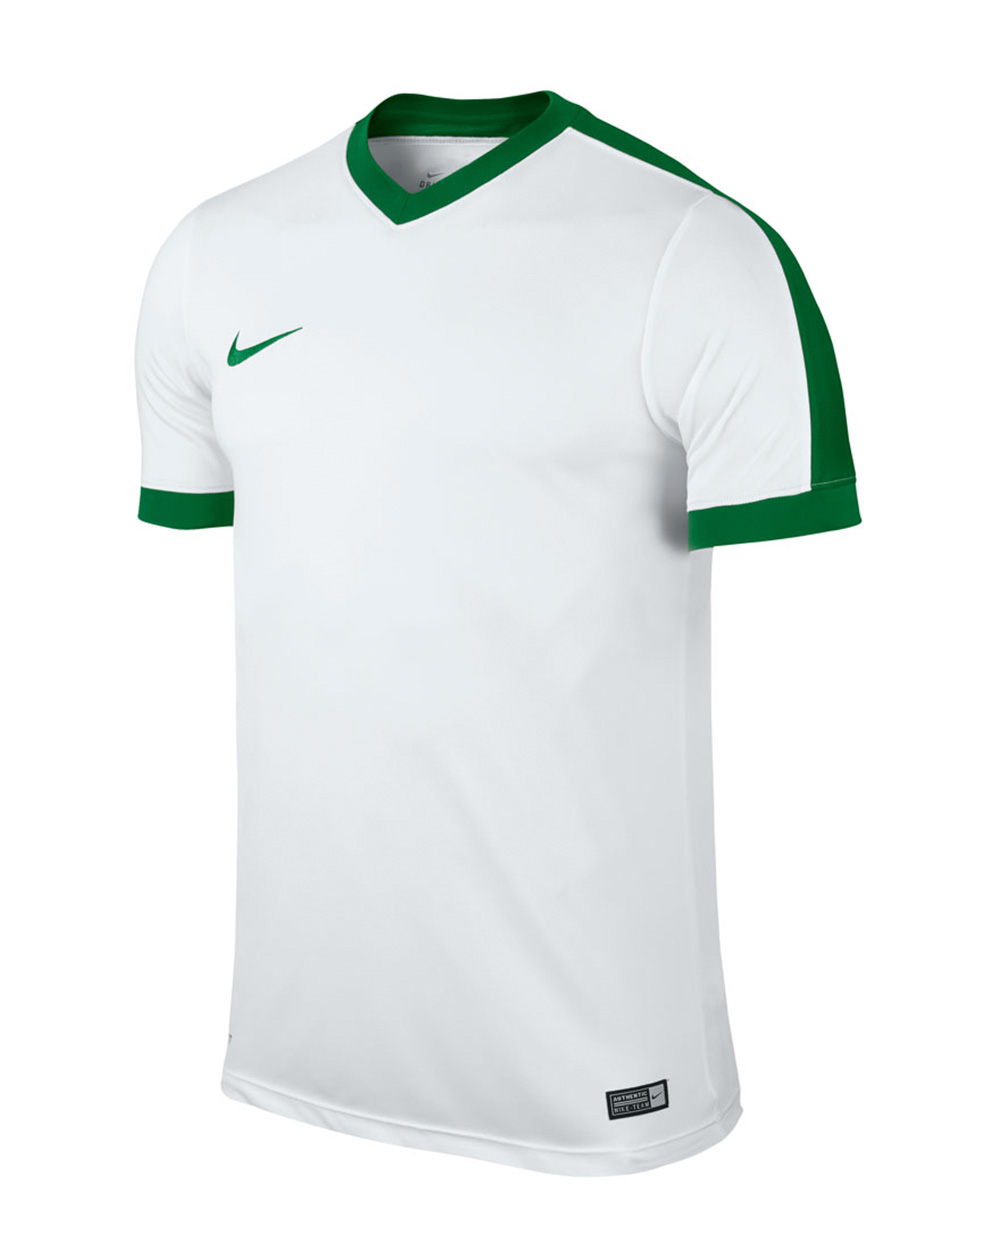 Blanca Verde Striker Nike Con Camiseta Iv Camisetas VUzMpS